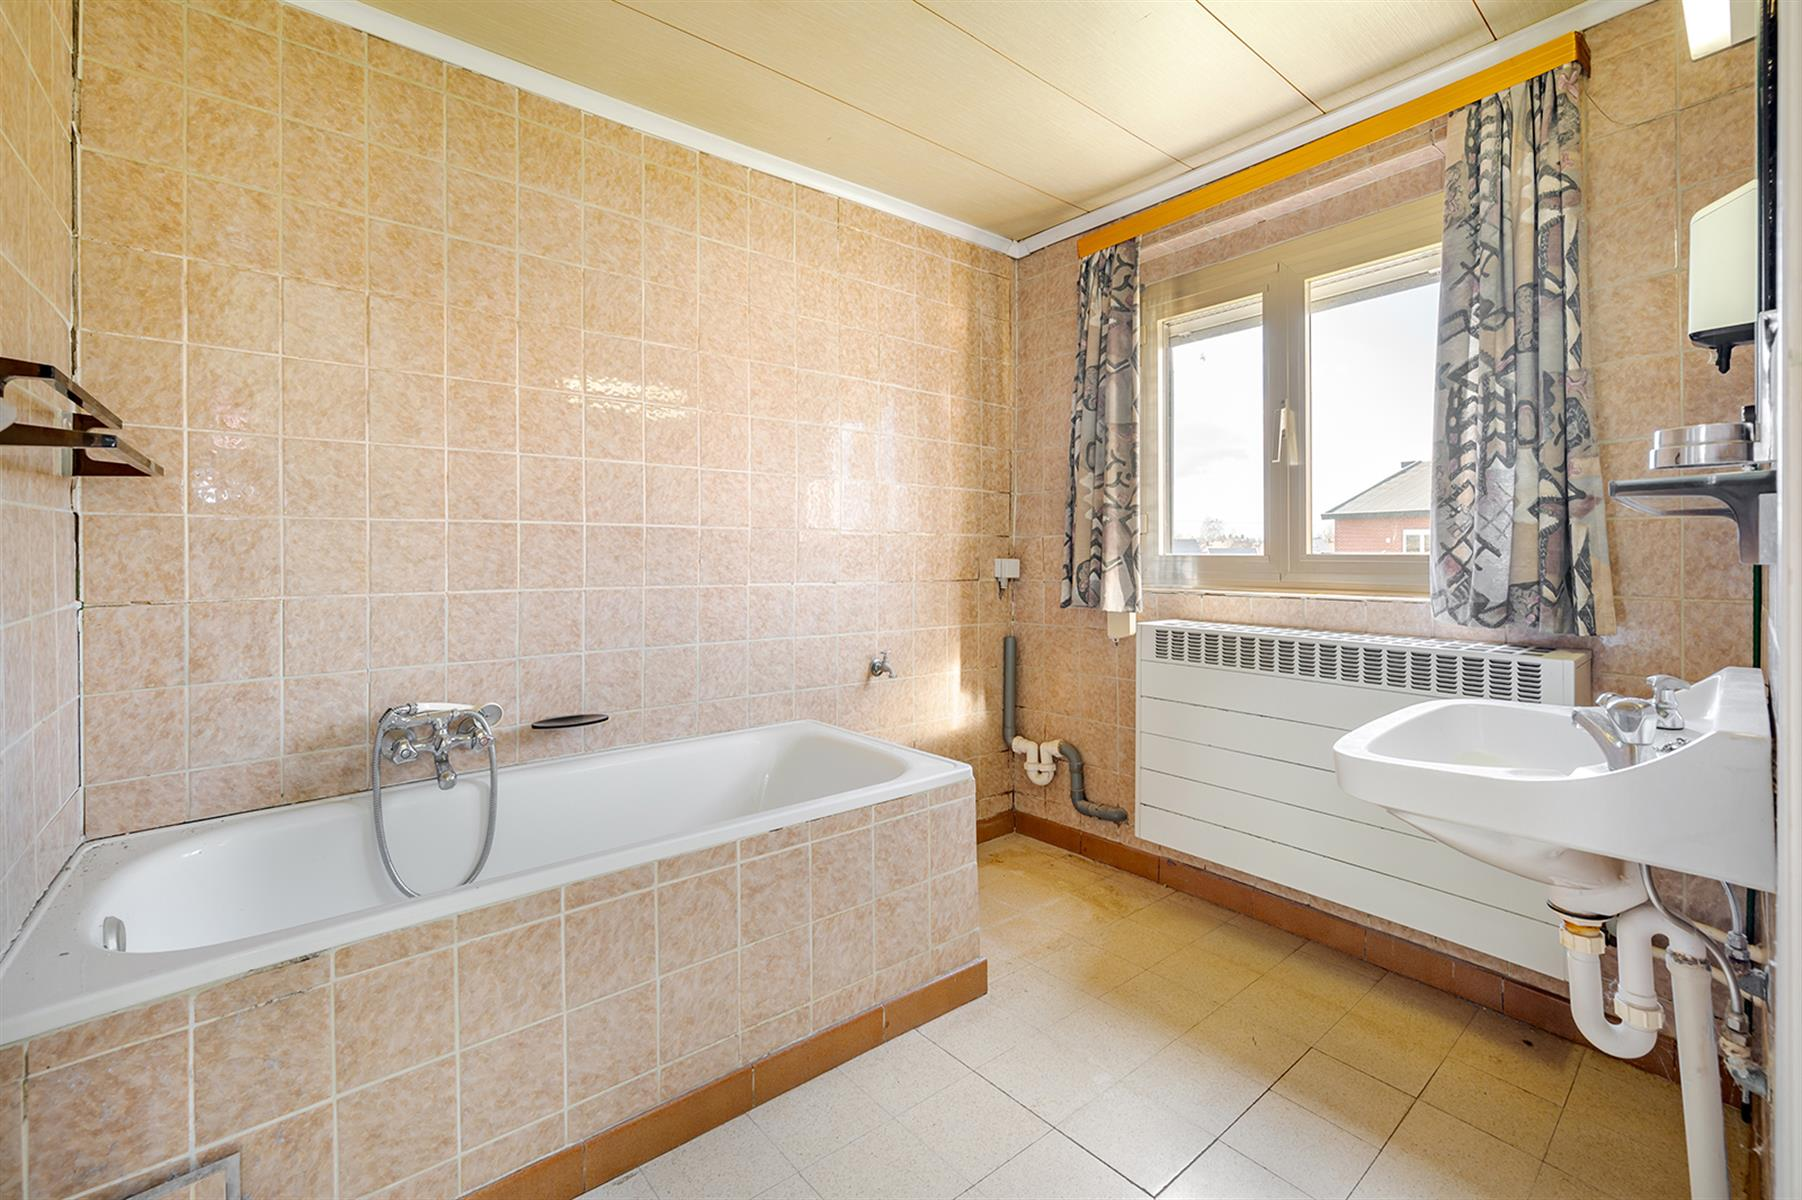 Maison - Remicourt - #4293207-10